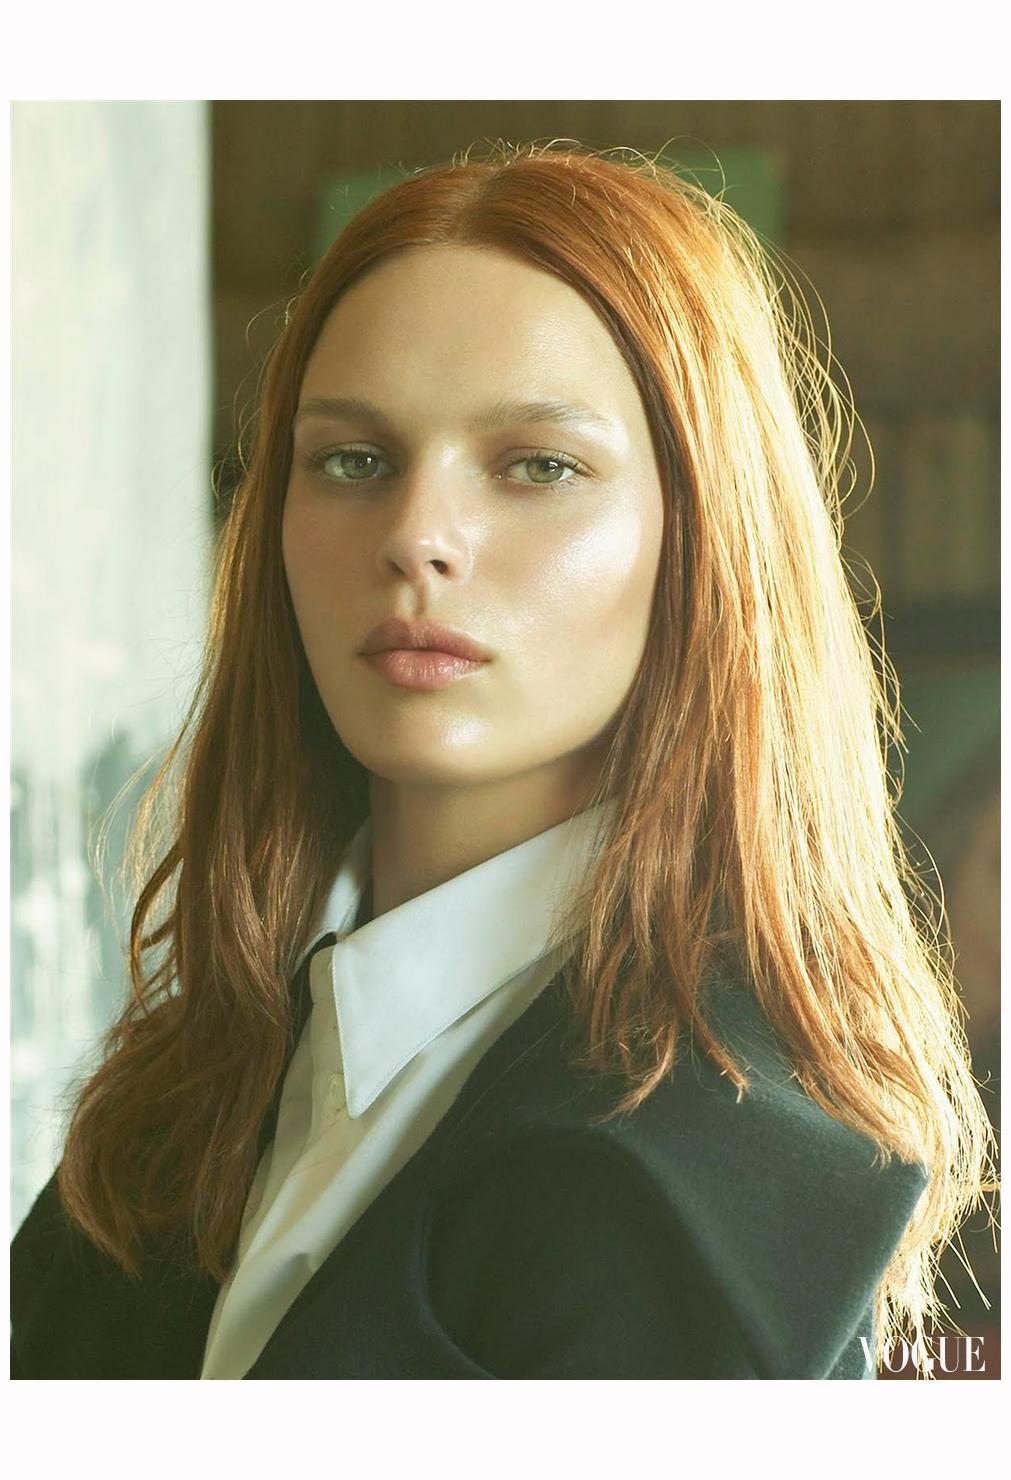 Elise Crombez